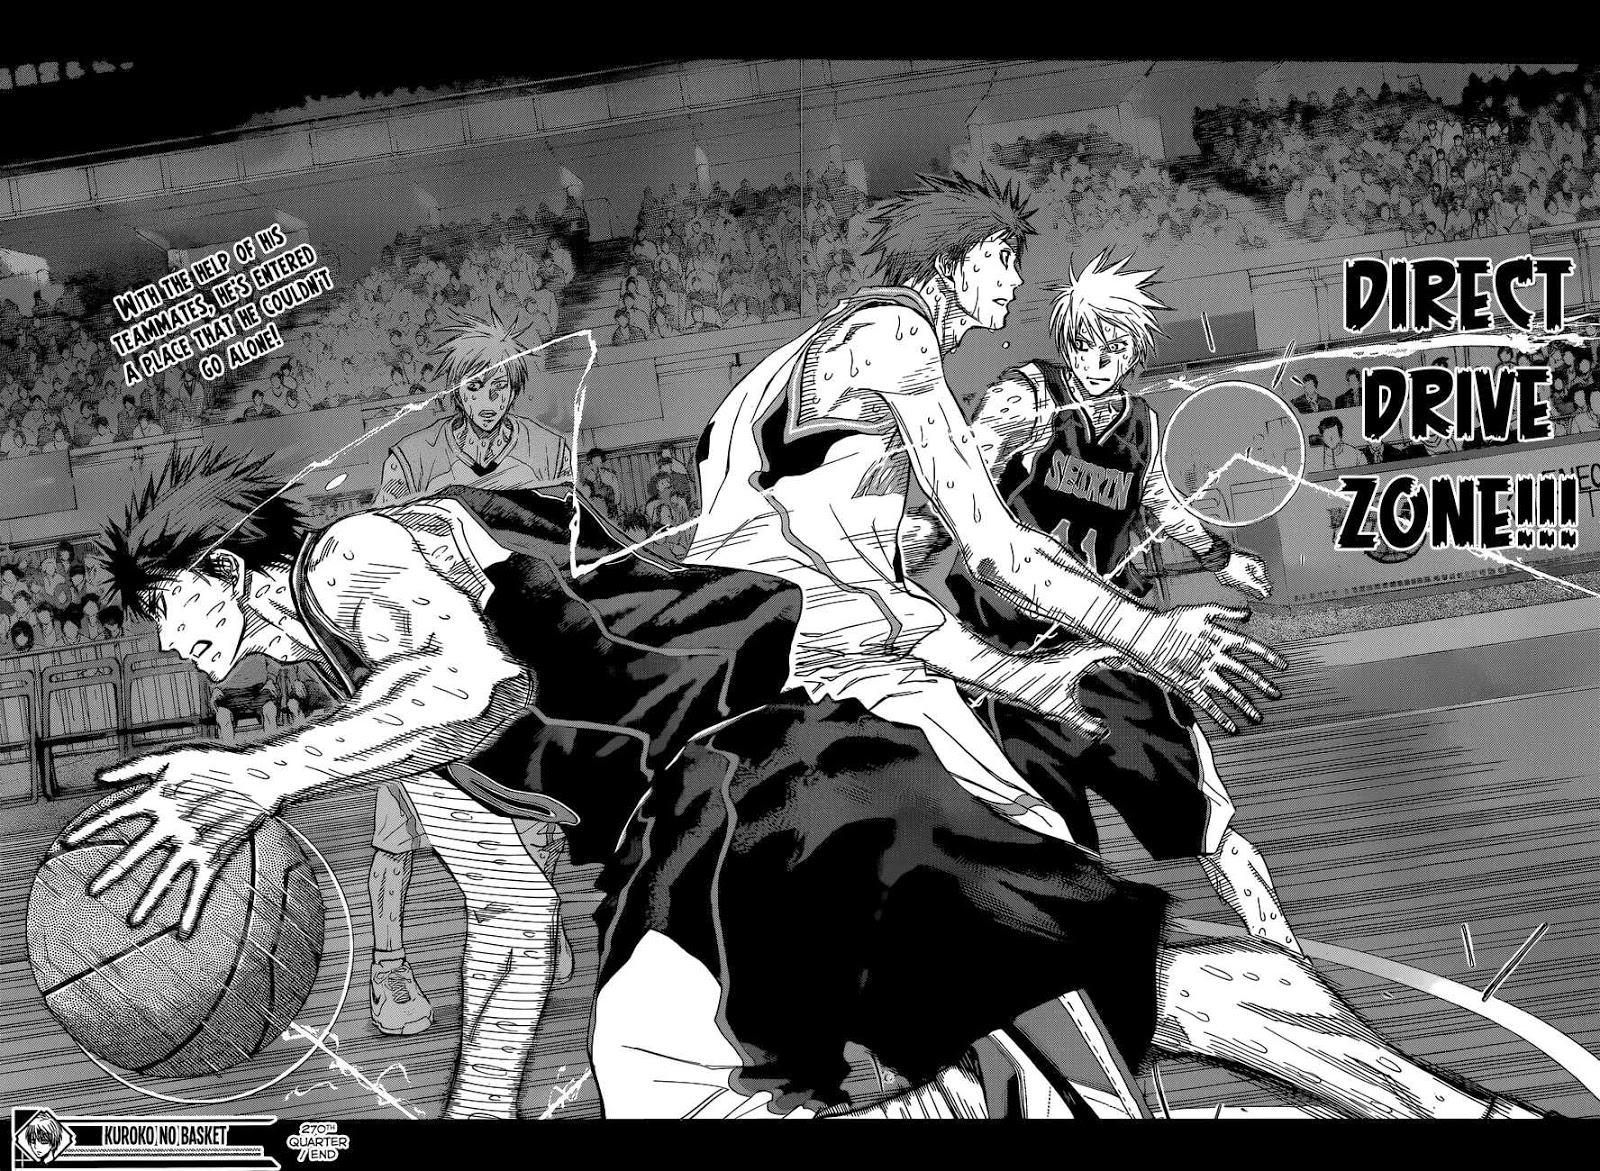 Kuroko no Basket Manga Chapter 270 - Image 17-18